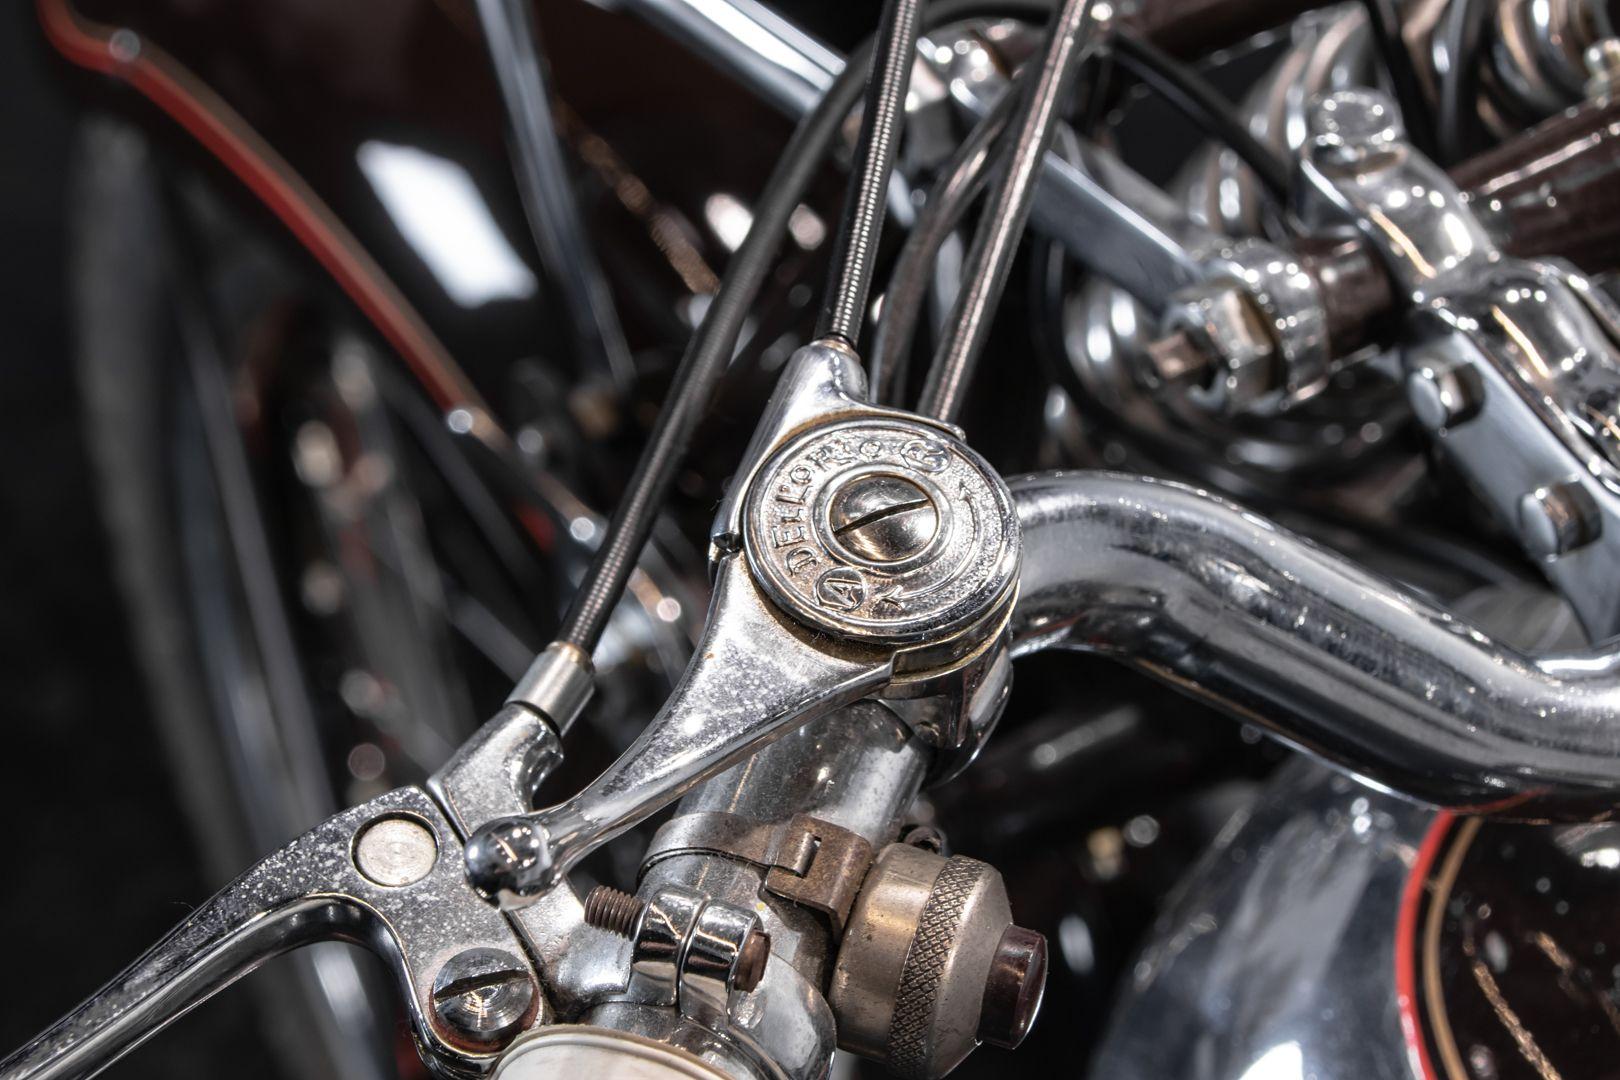 1951 Moto Guzzi 500 72190